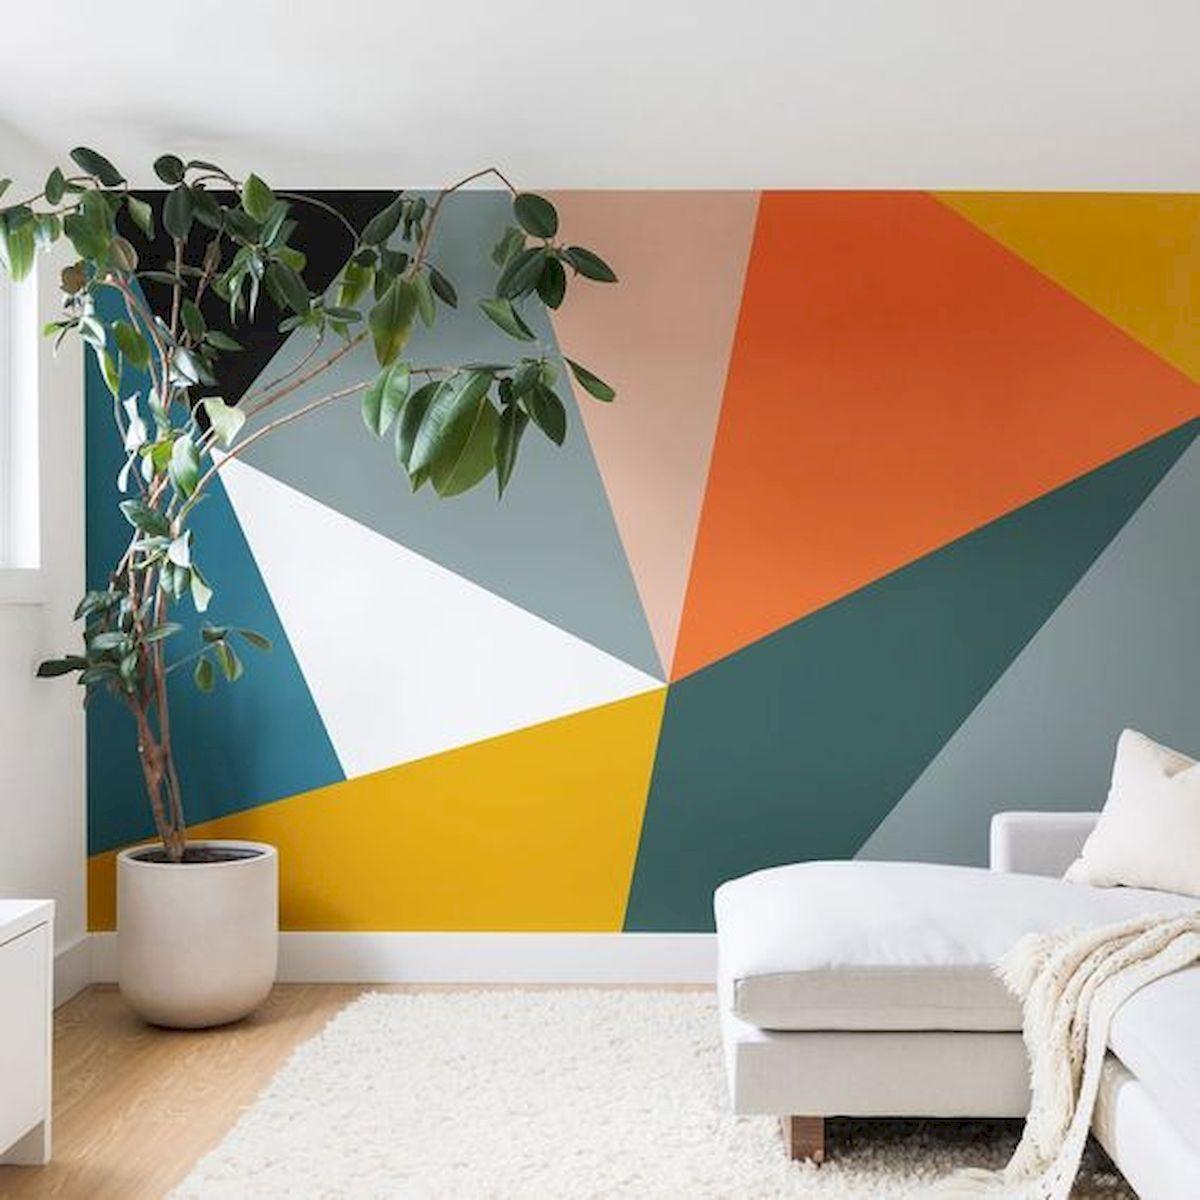 60 Best Geometric Wall Art Paint Design Ideas 1 33decor Bedroom Wall Designs Bedroom Wall Paint Geometric Wall Art